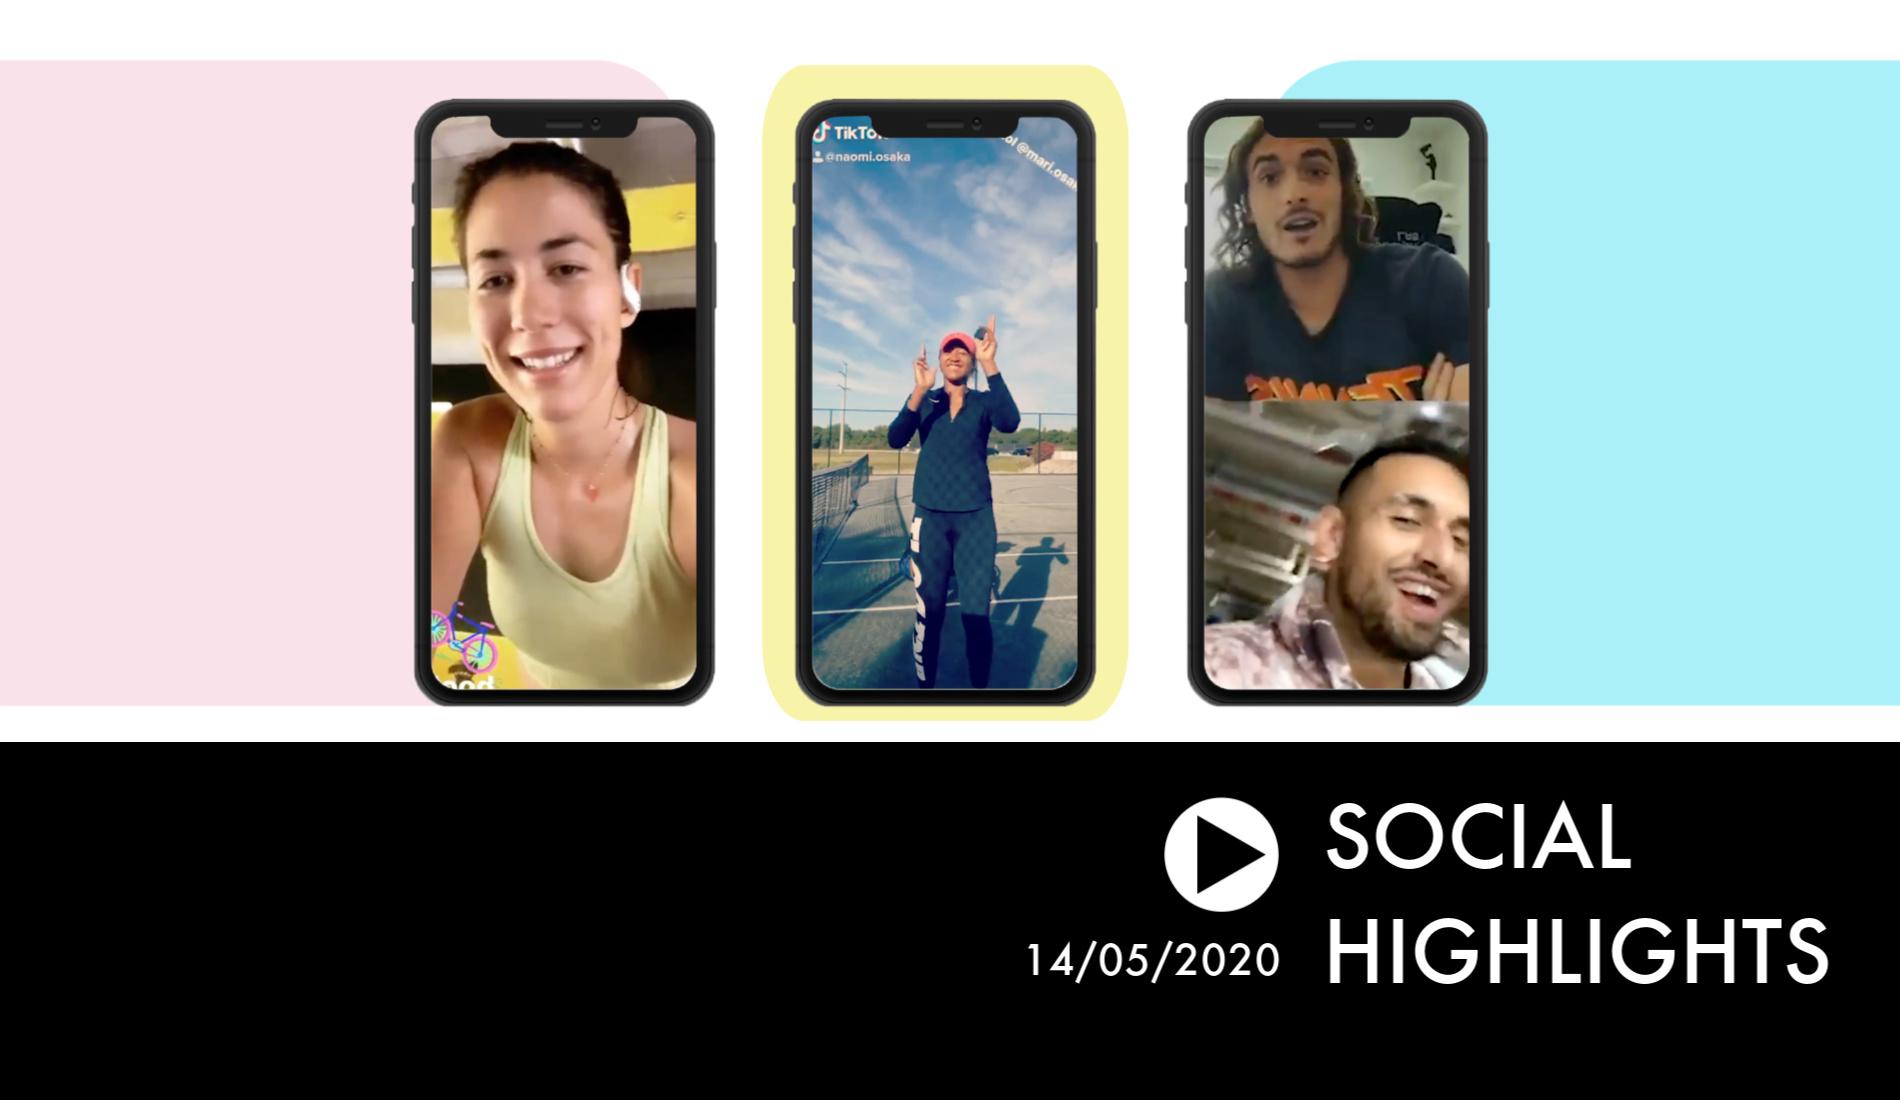 Social Highlights - Muguruza and Osaka with some musical vibes